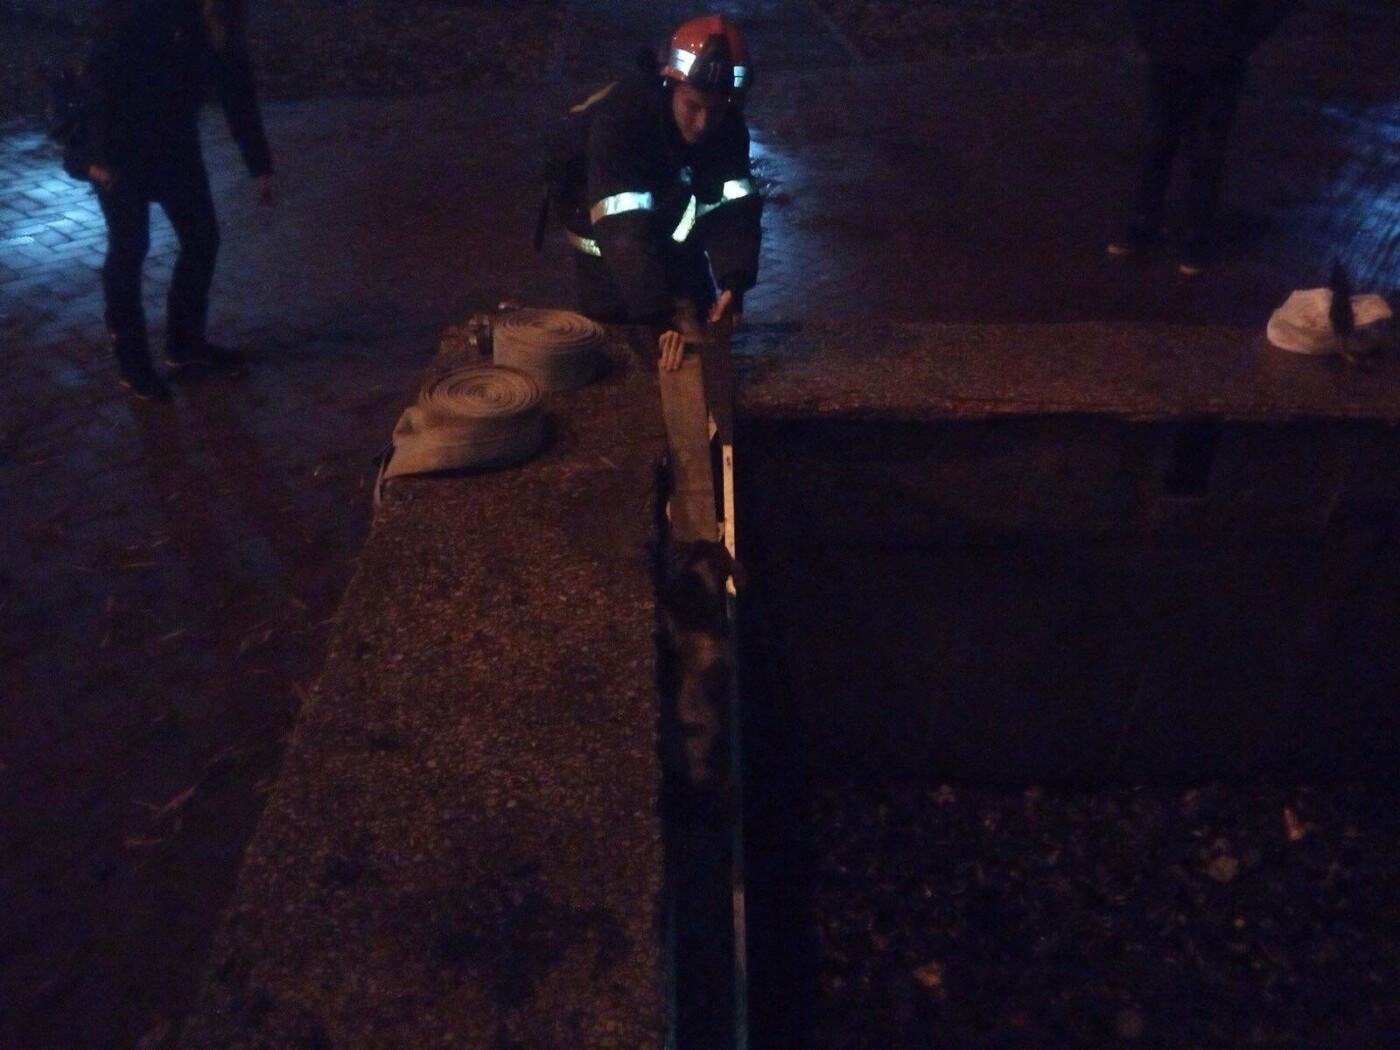 На Днепропетровщине спасатели доставали собаку из ловушки, - ФОТО, фото-1